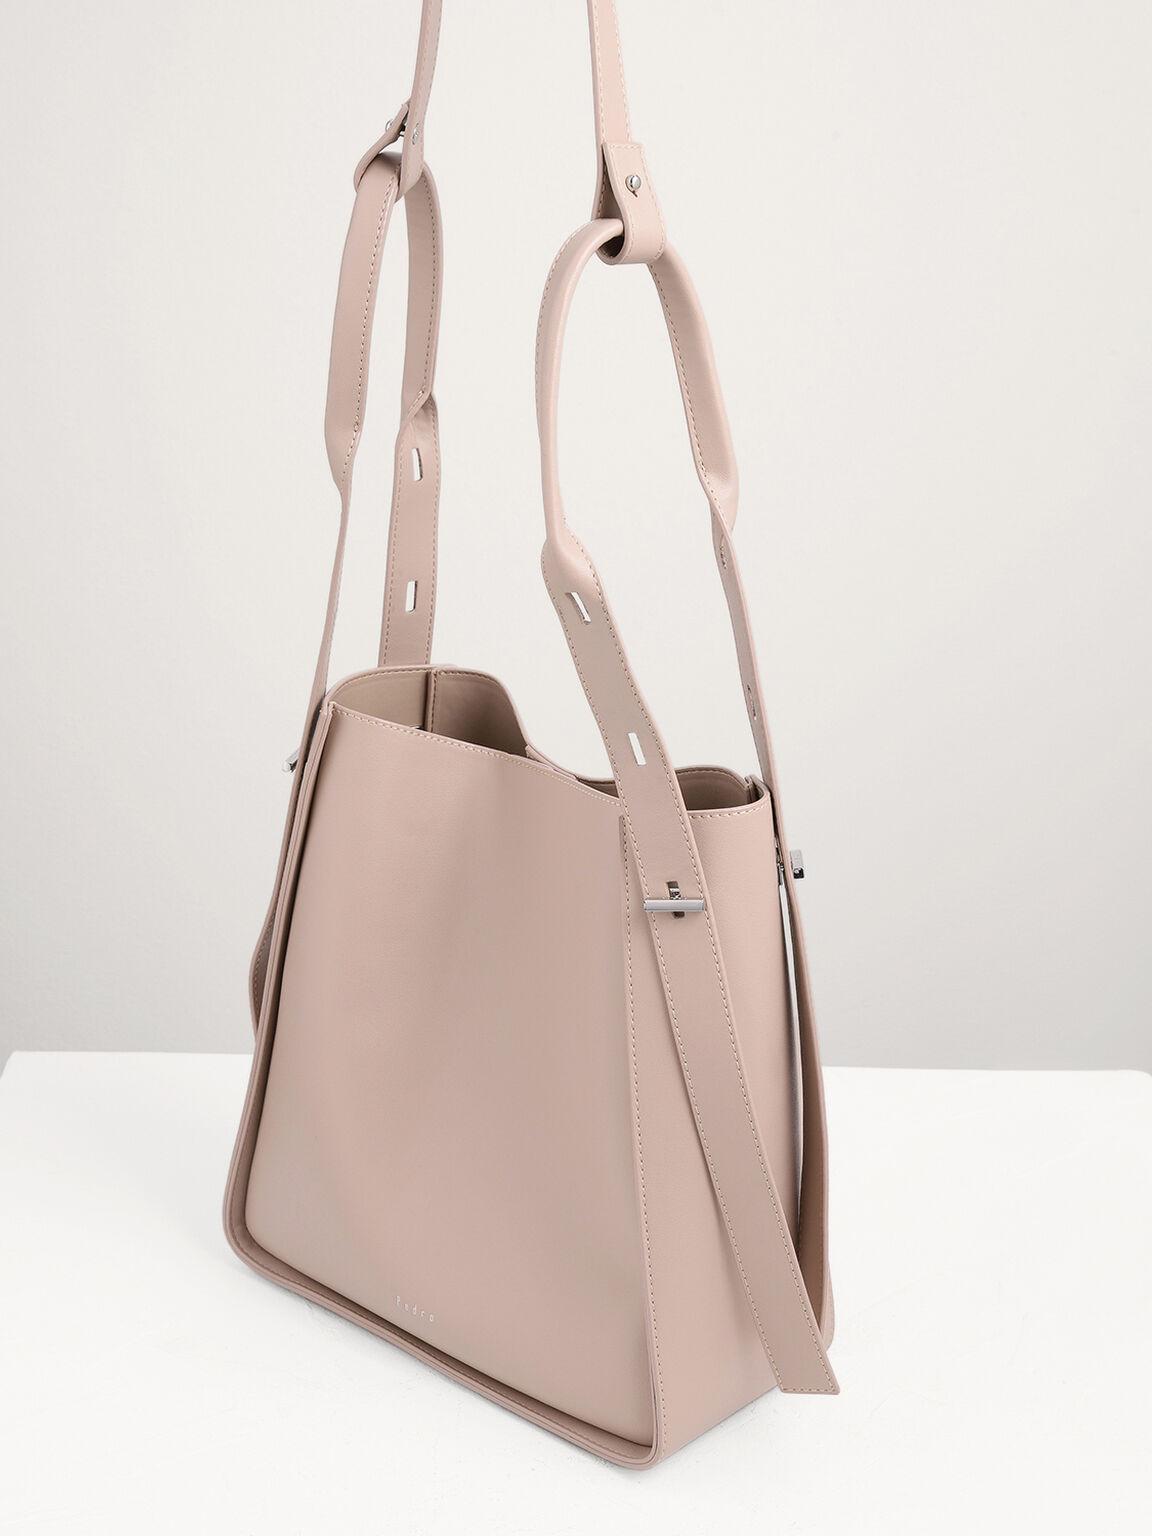 Duo-Carry Hobo Bag, Nude, hi-res